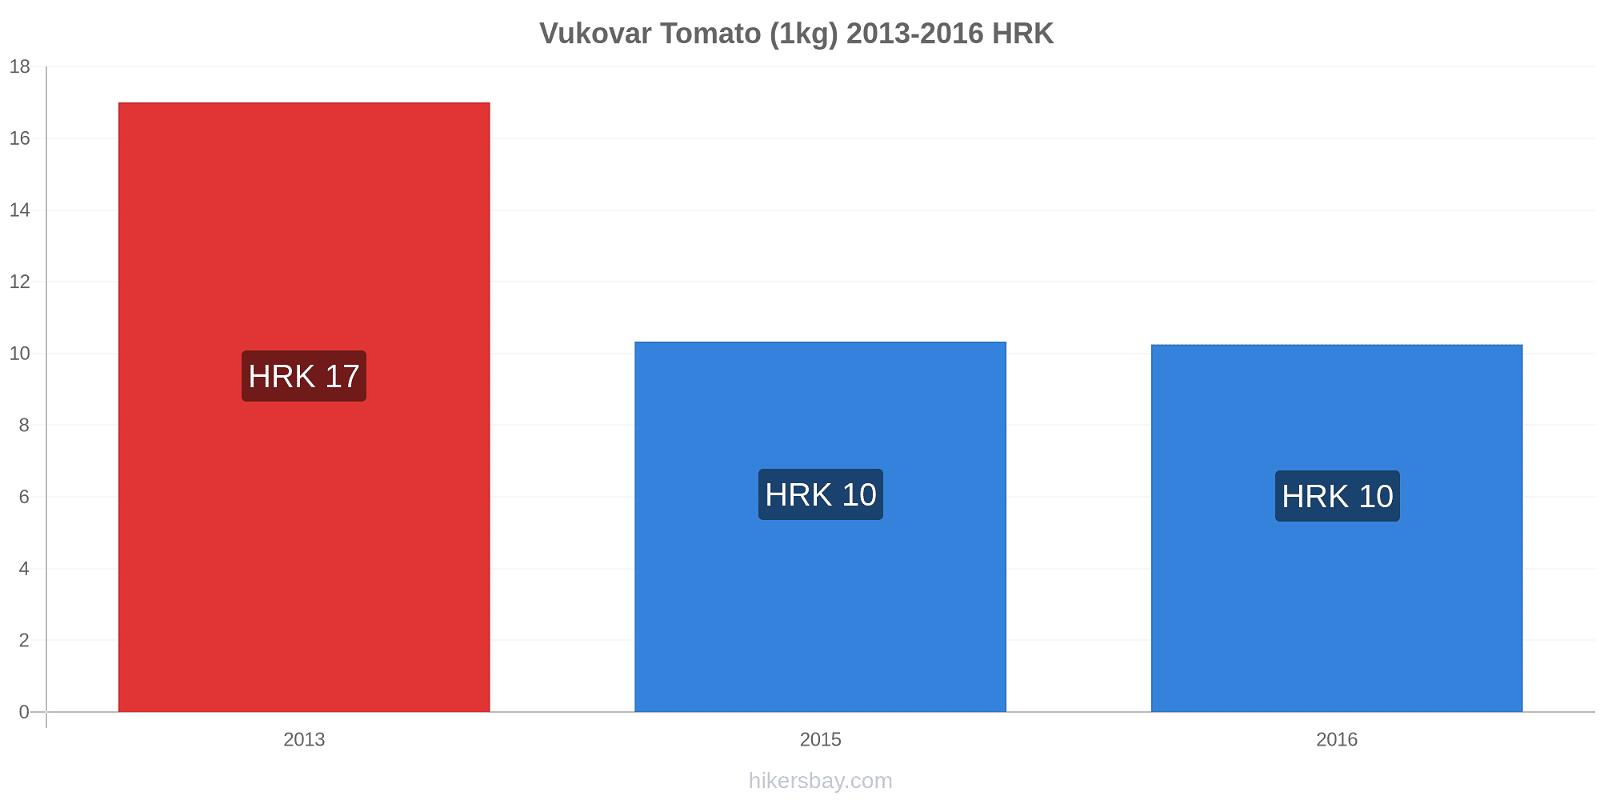 Vukovar price changes Tomato (1kg) hikersbay.com